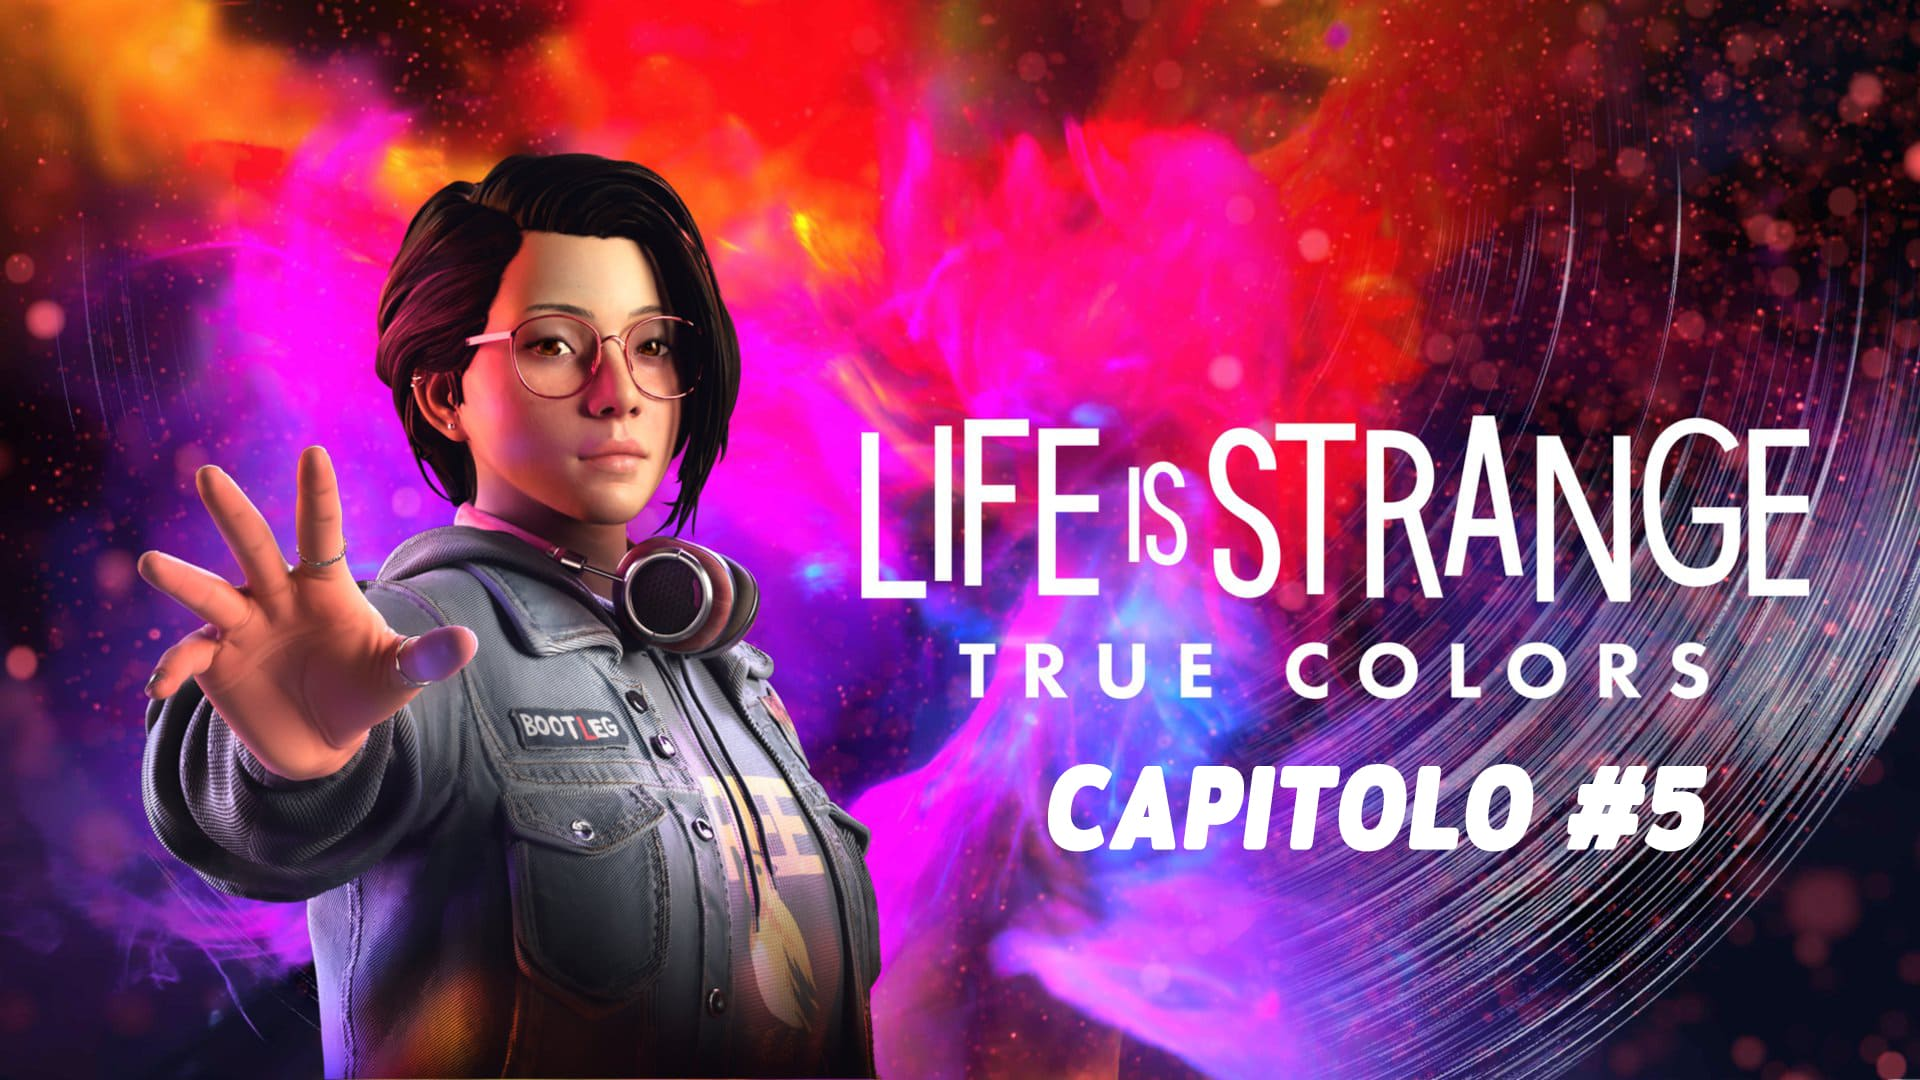 life is strange true colors capitolo 5